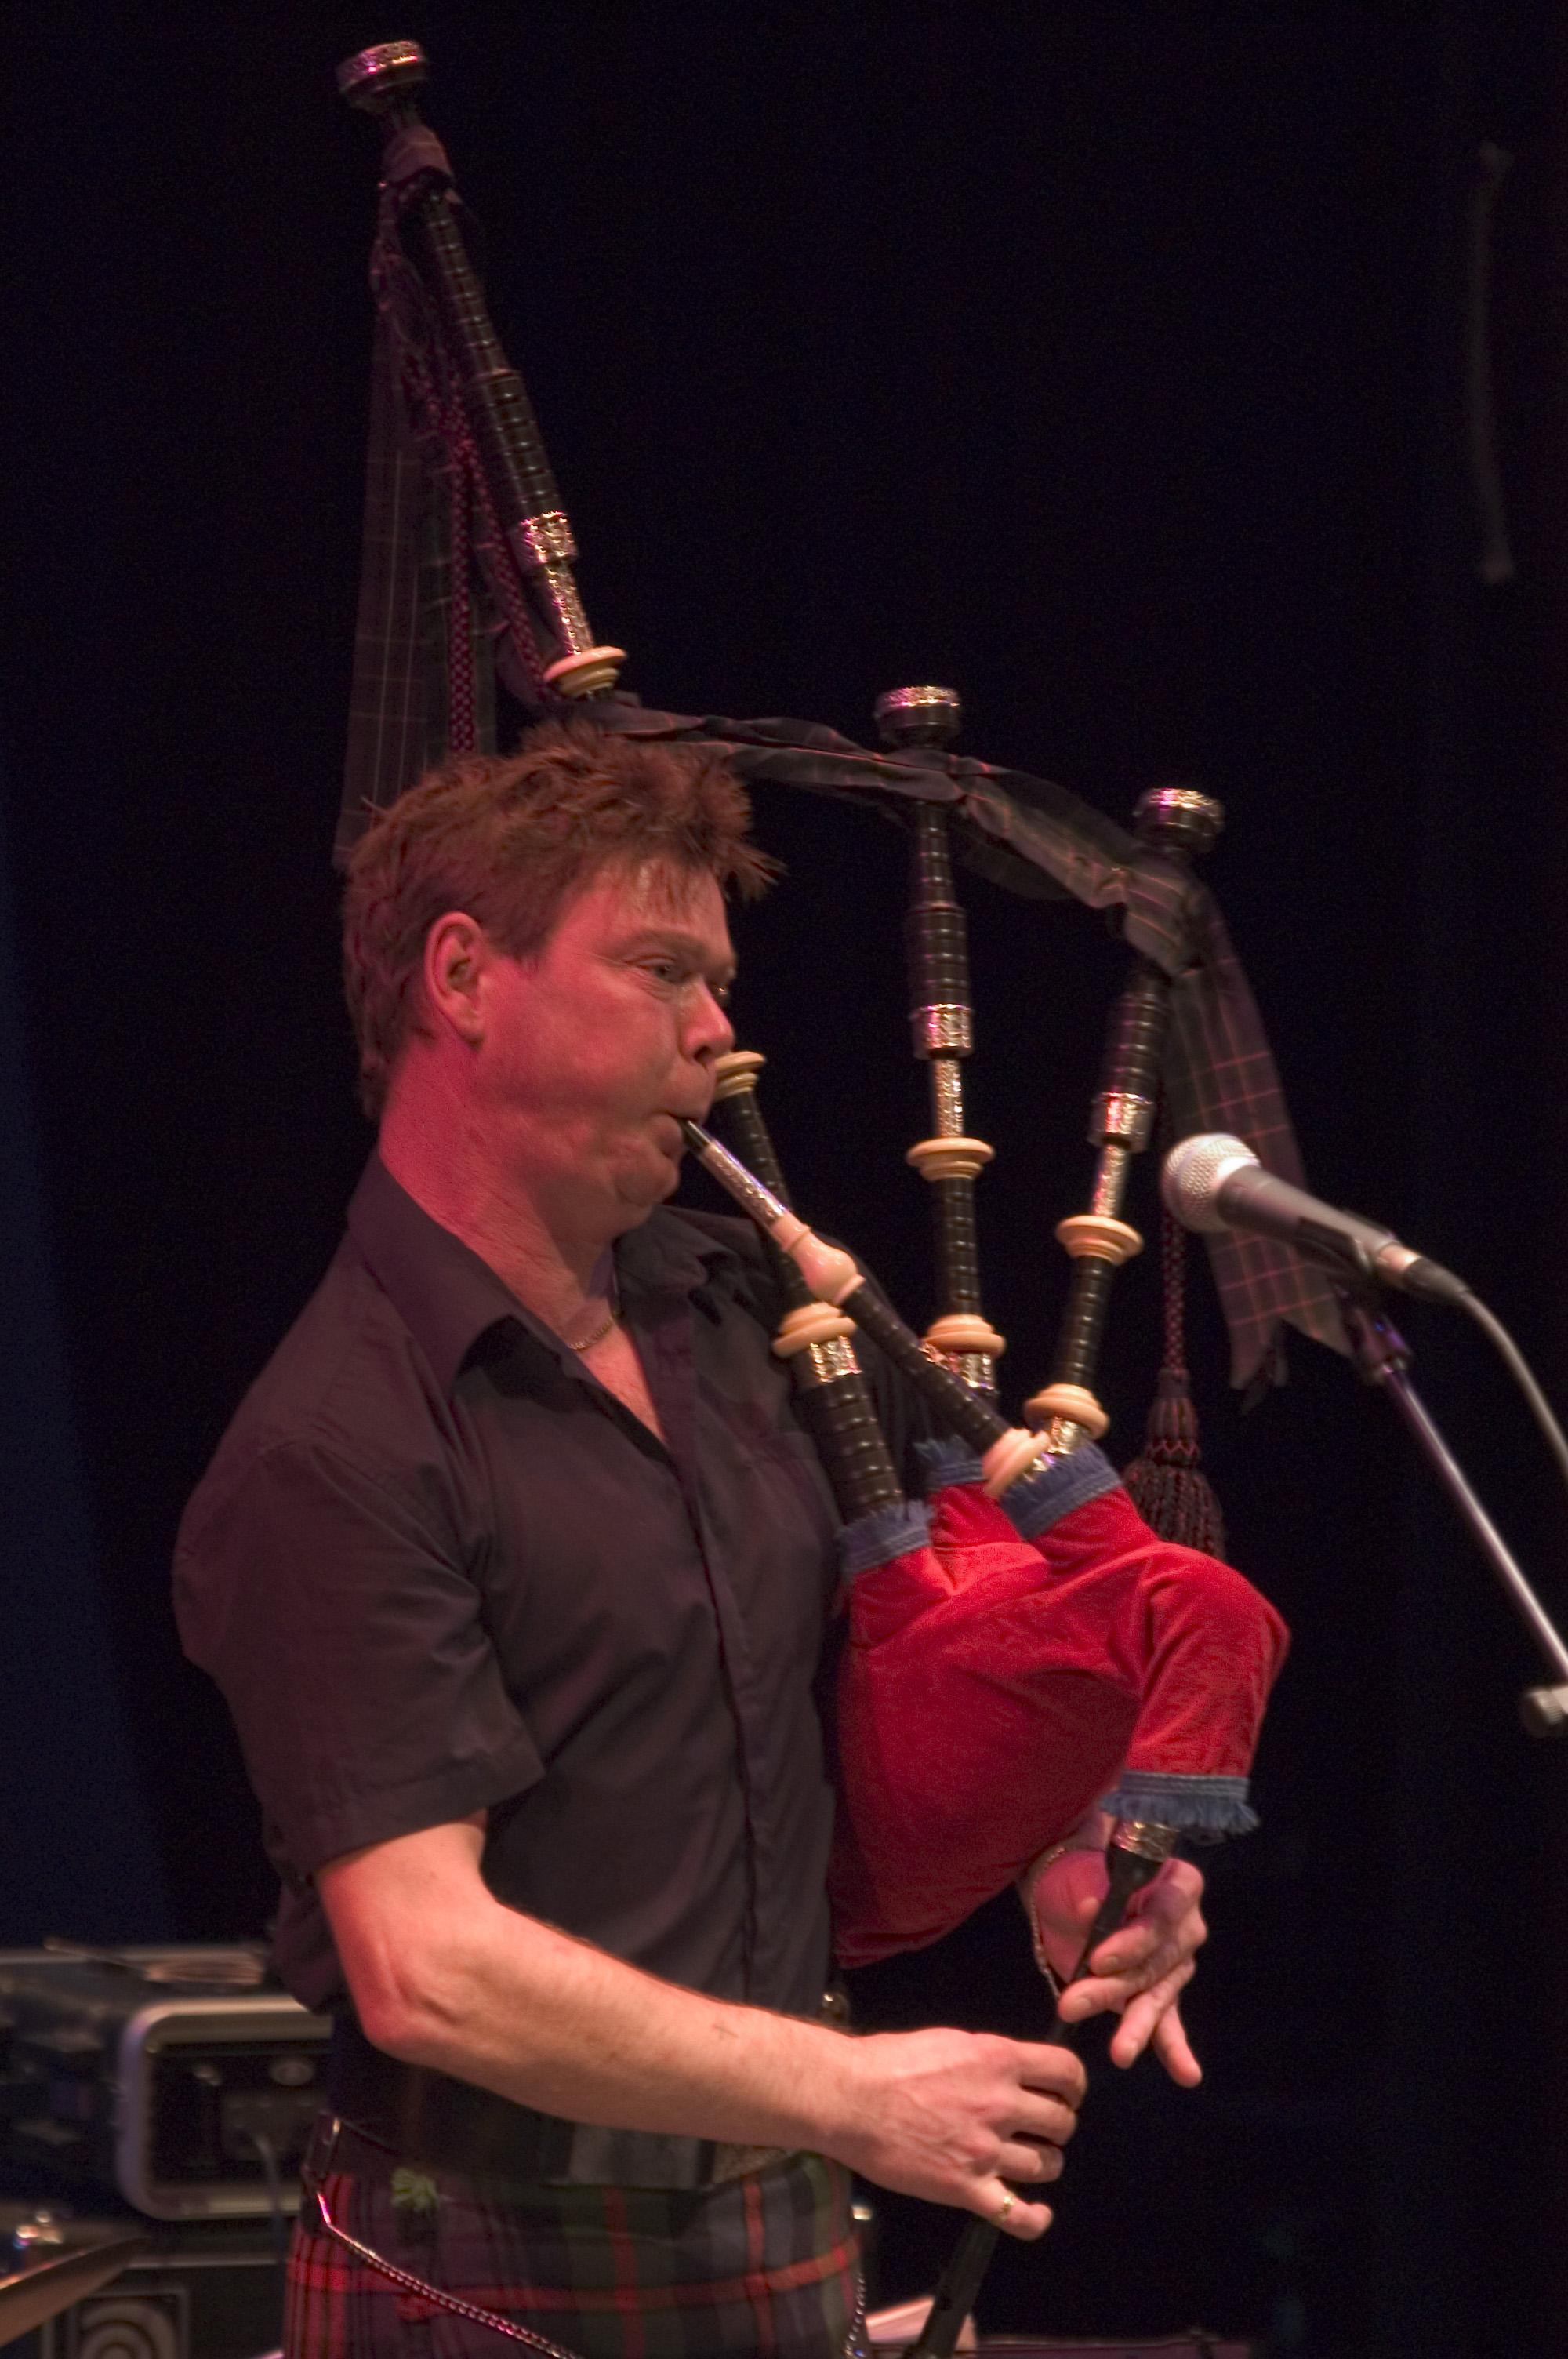 Gordon playing at Perthshire Amber, 2005